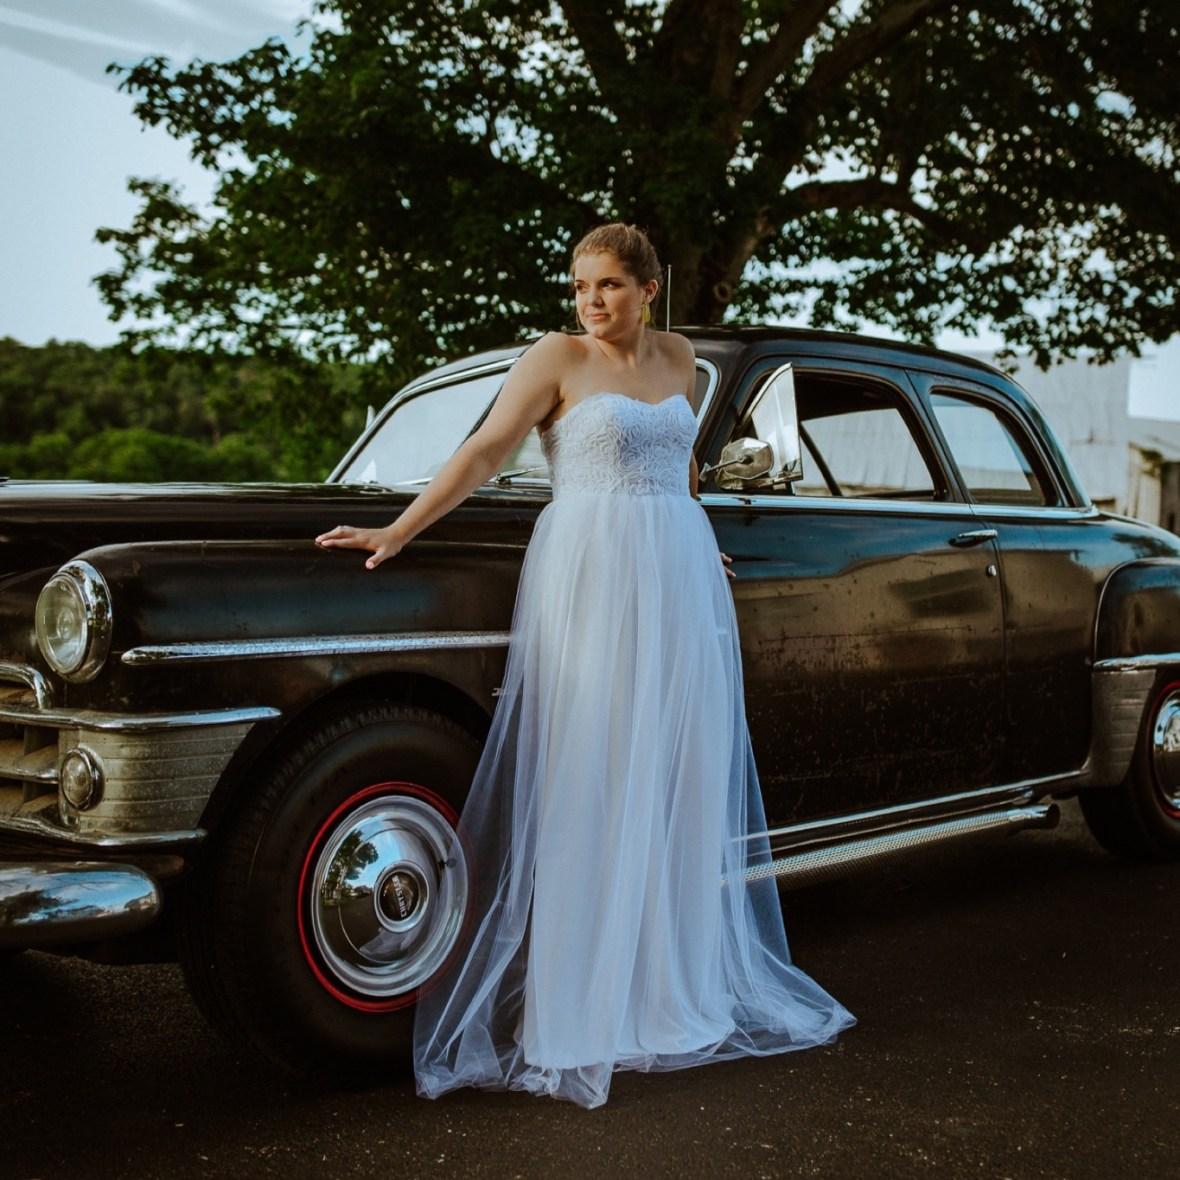 21_WCTM3811ab_Lavender_Farm_Phillips_Clothier_Wedding_Kimberly